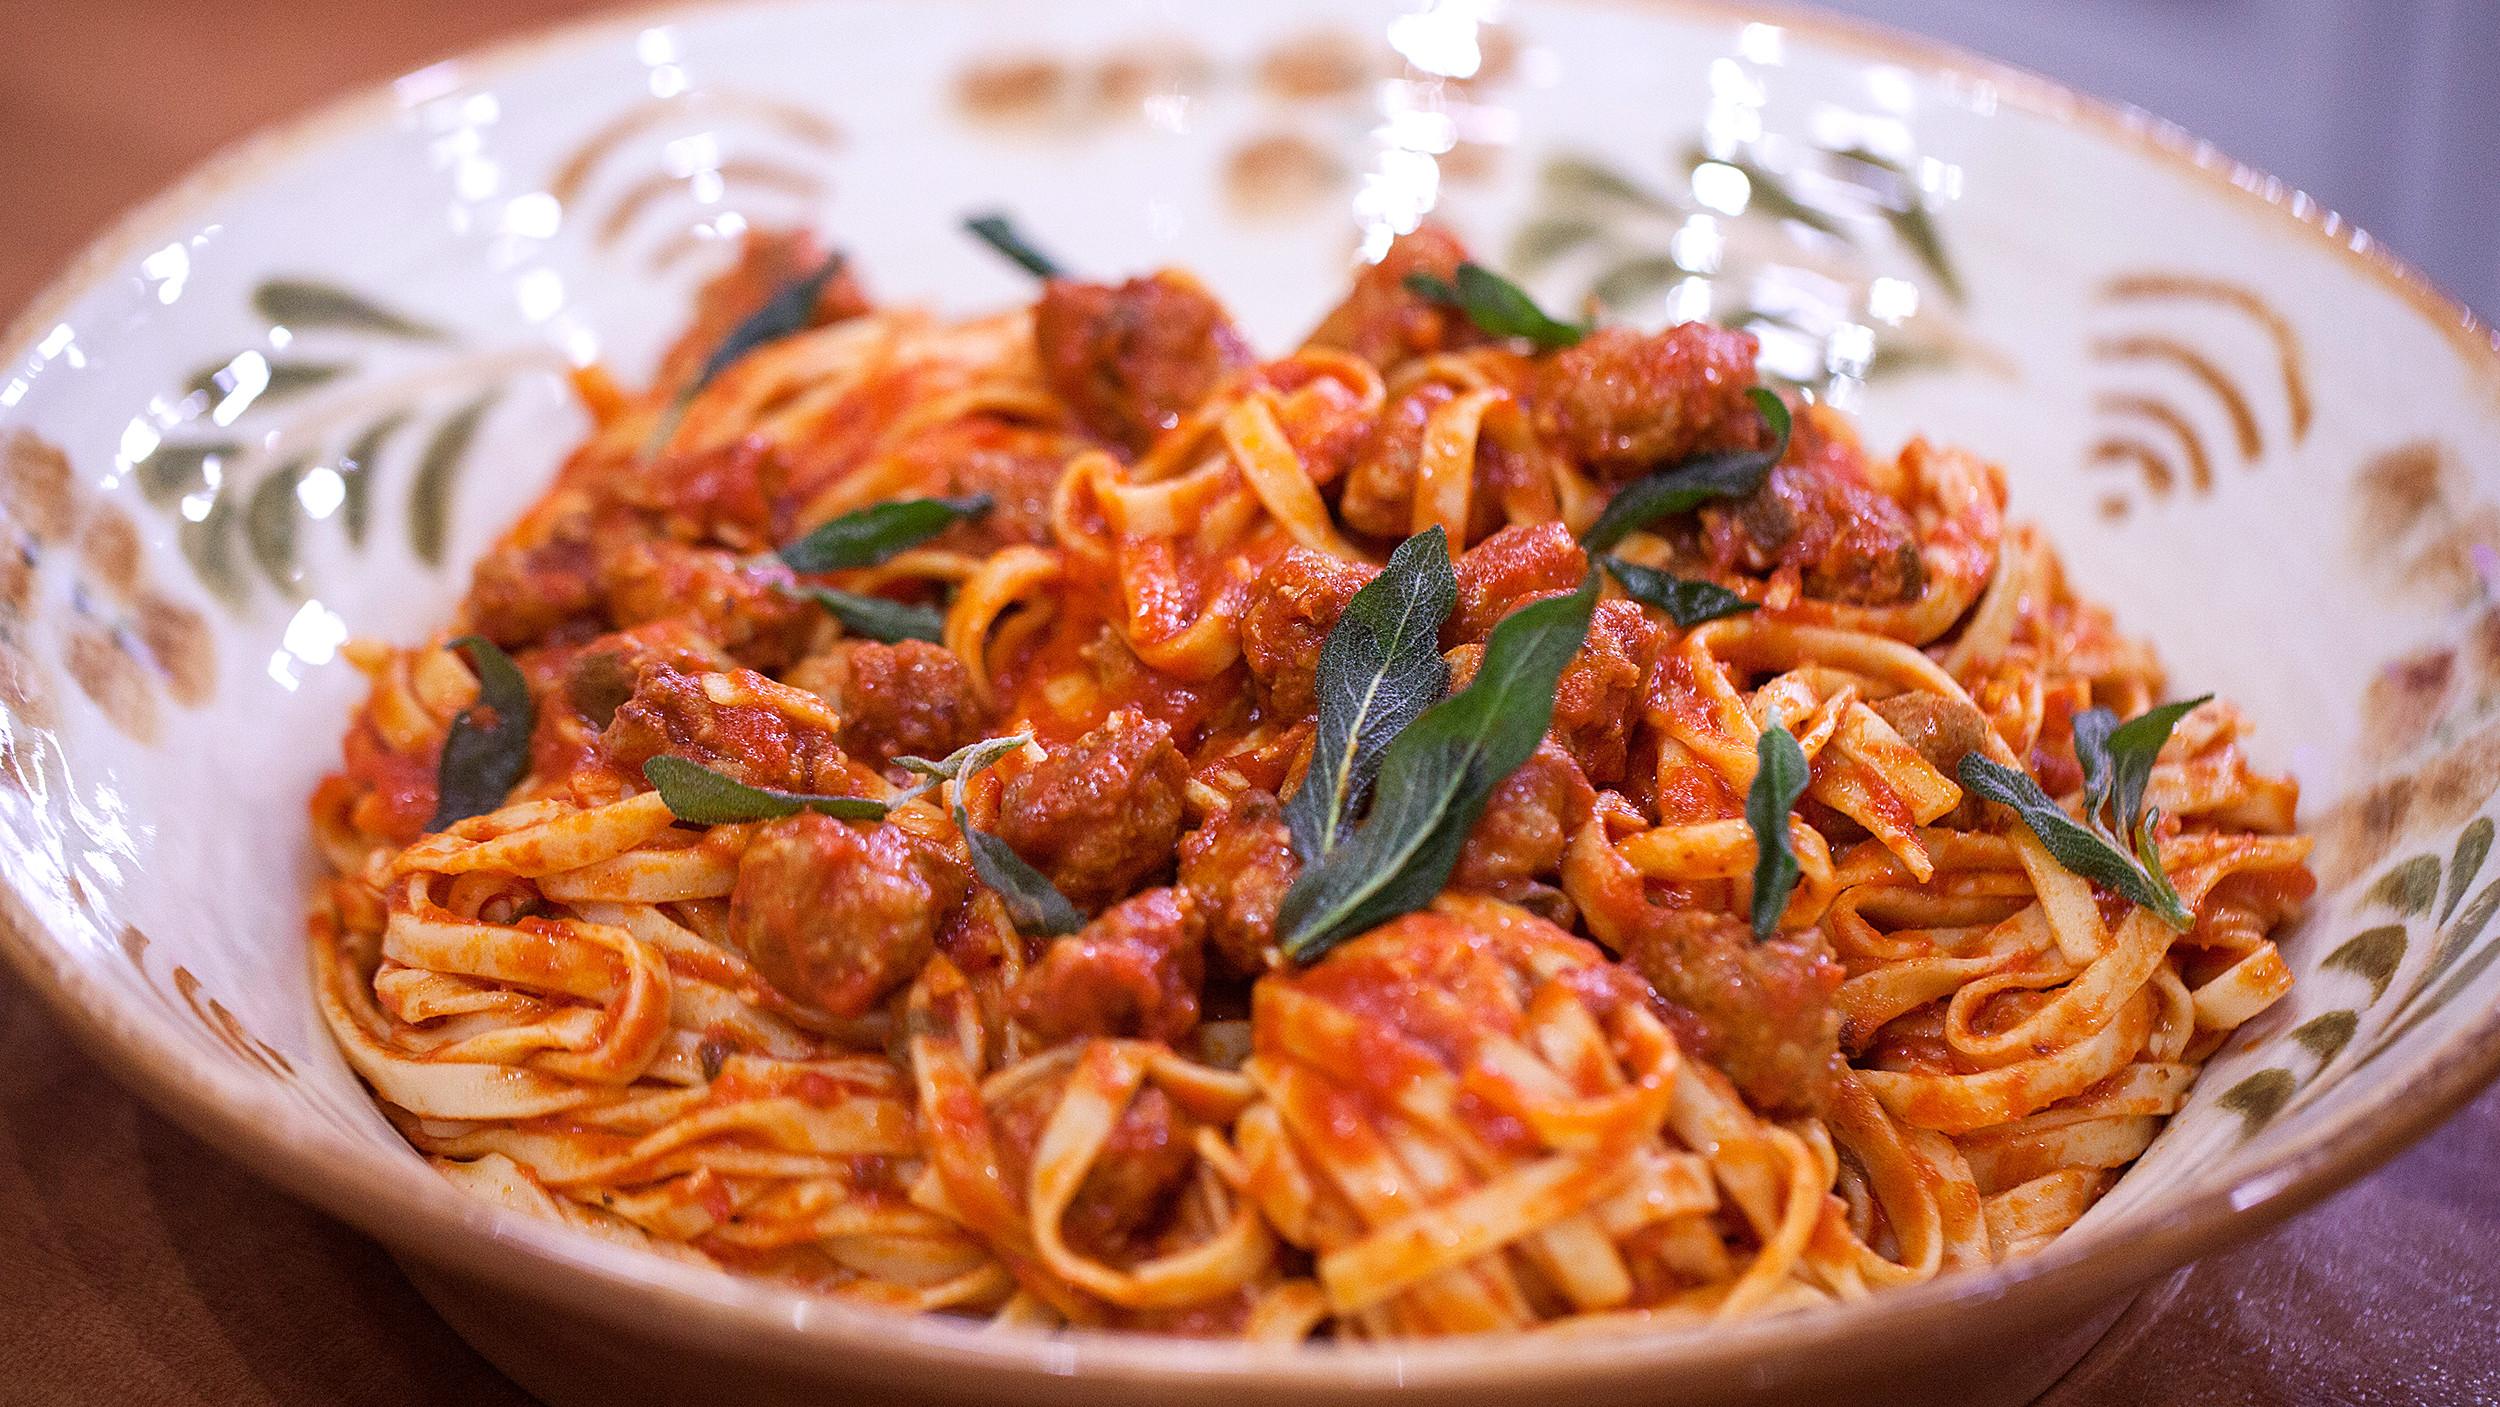 Spaghetti With Italian Sausage  Pasta with Italian Sausage Tomato Sauce and Crispy Sage